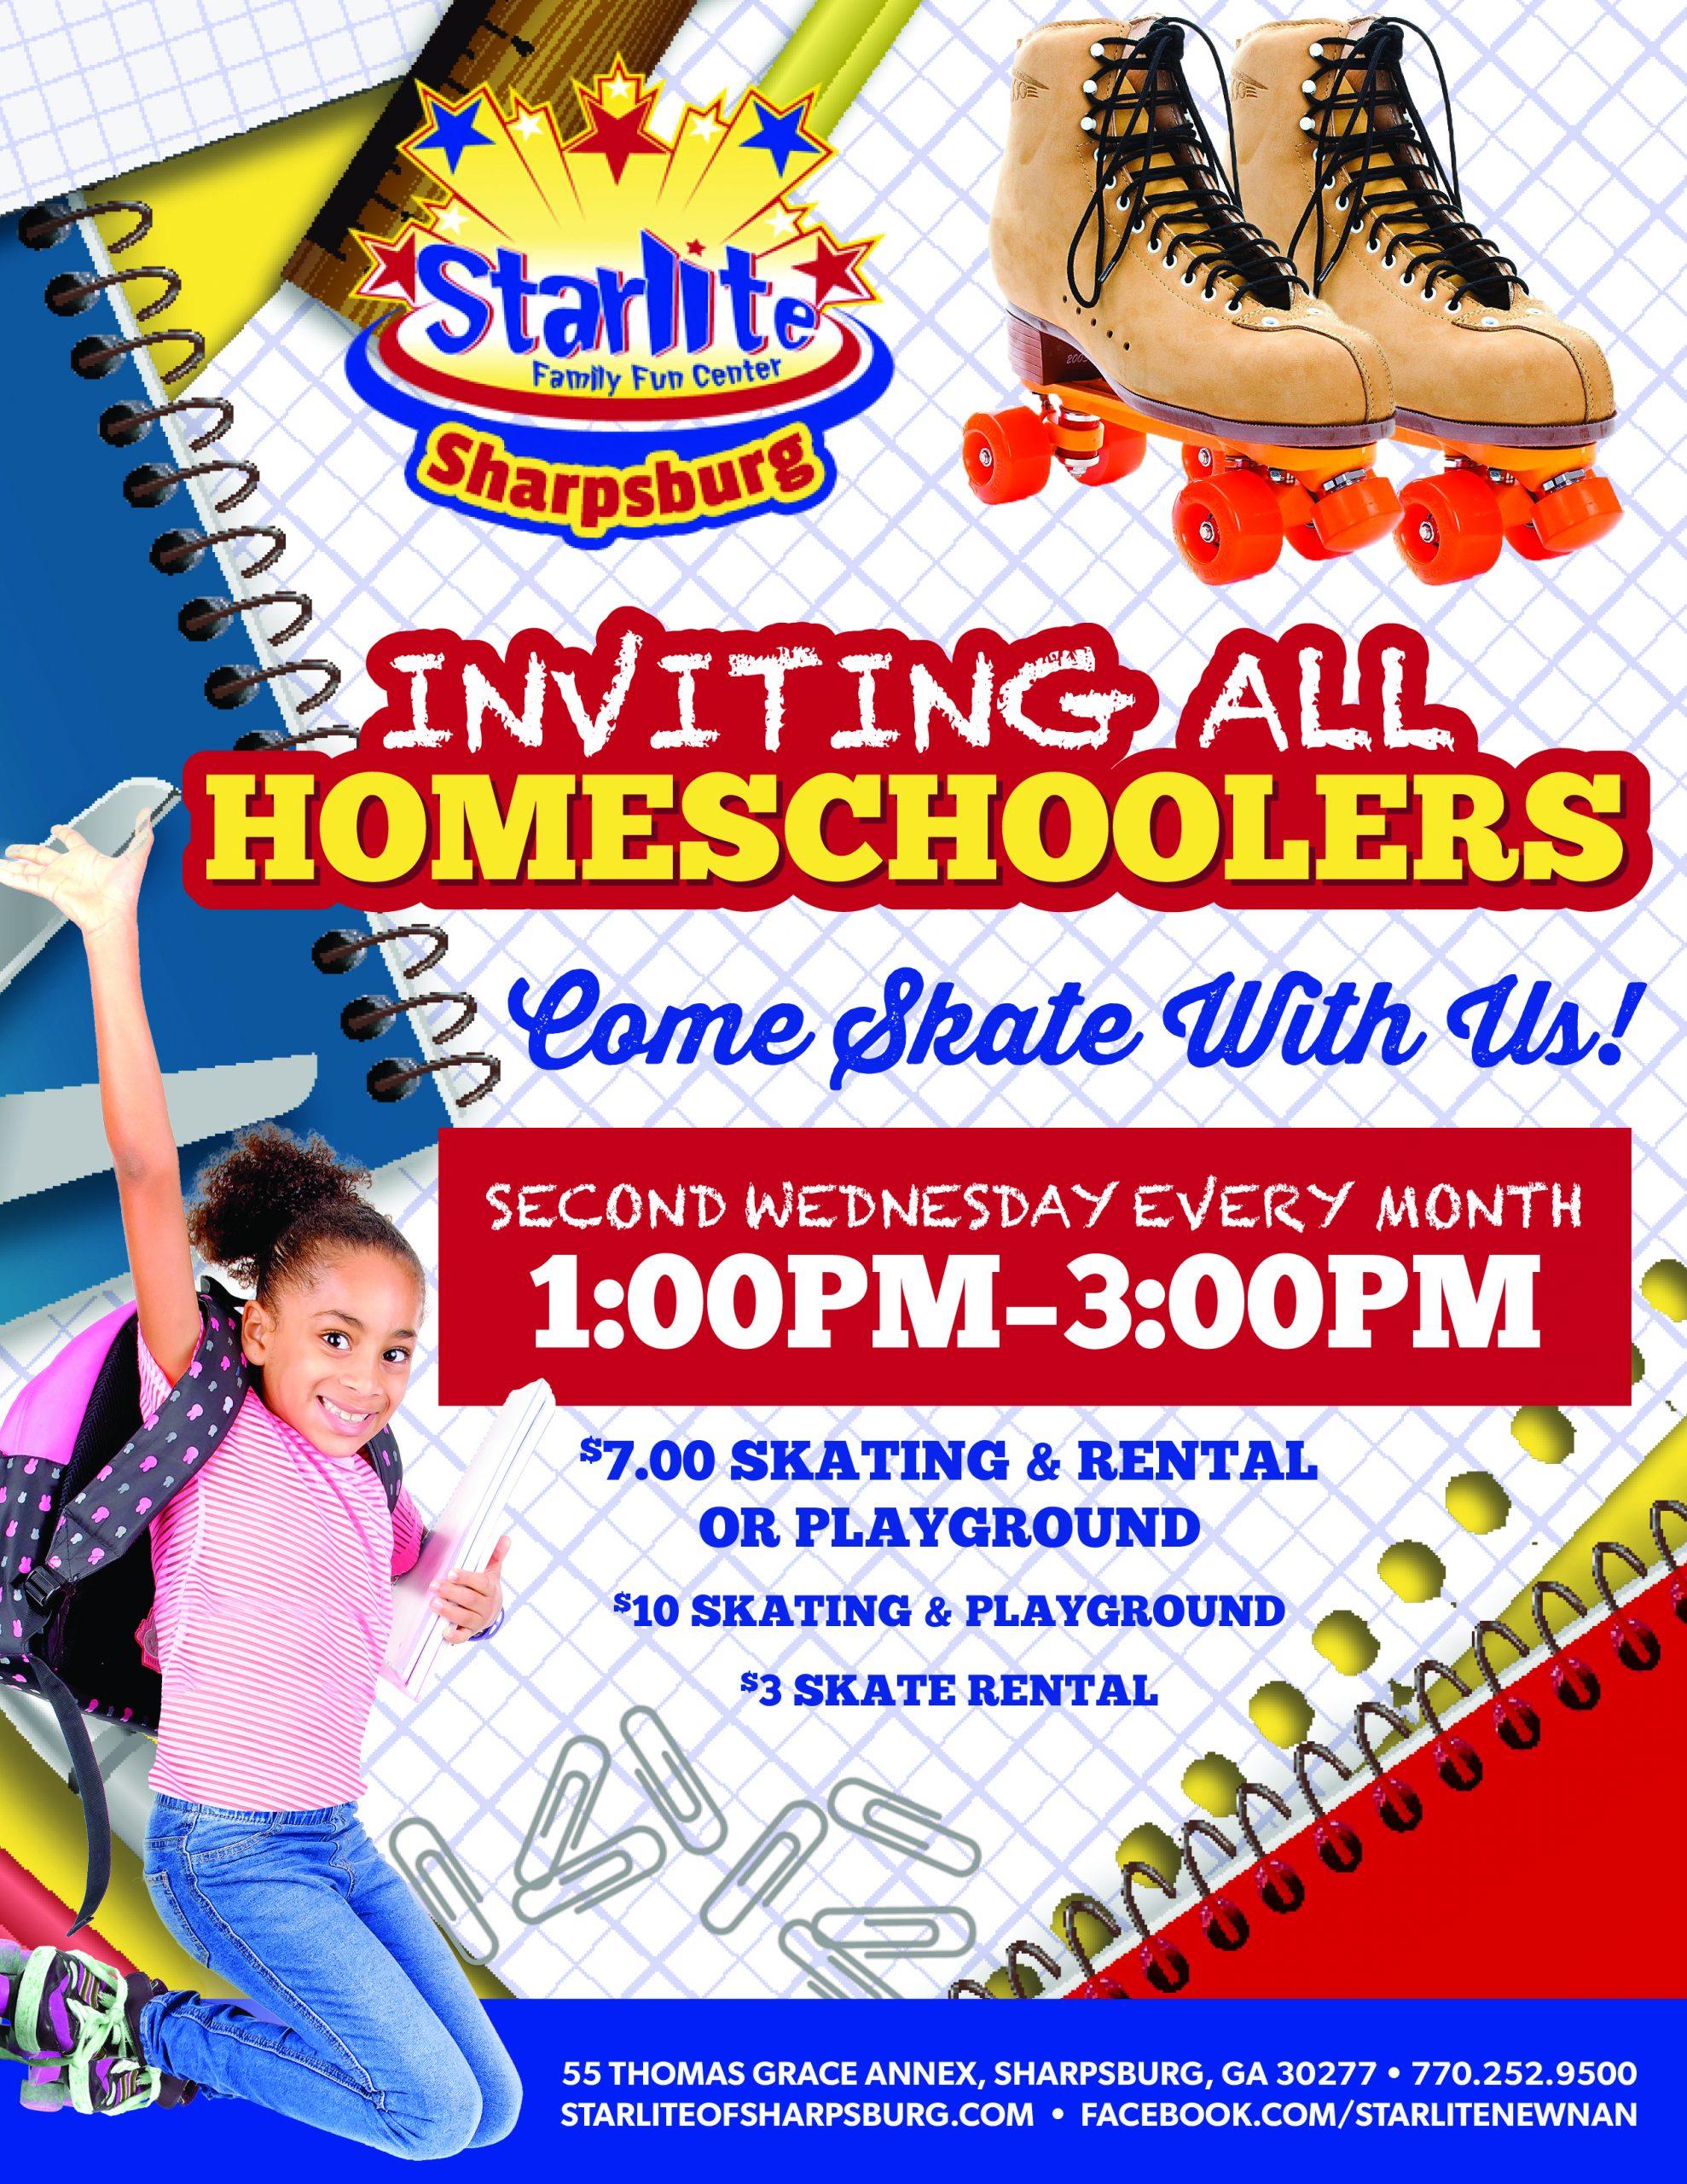 GA21-023 Homeschooler Skate Flyer-Sharpsburg